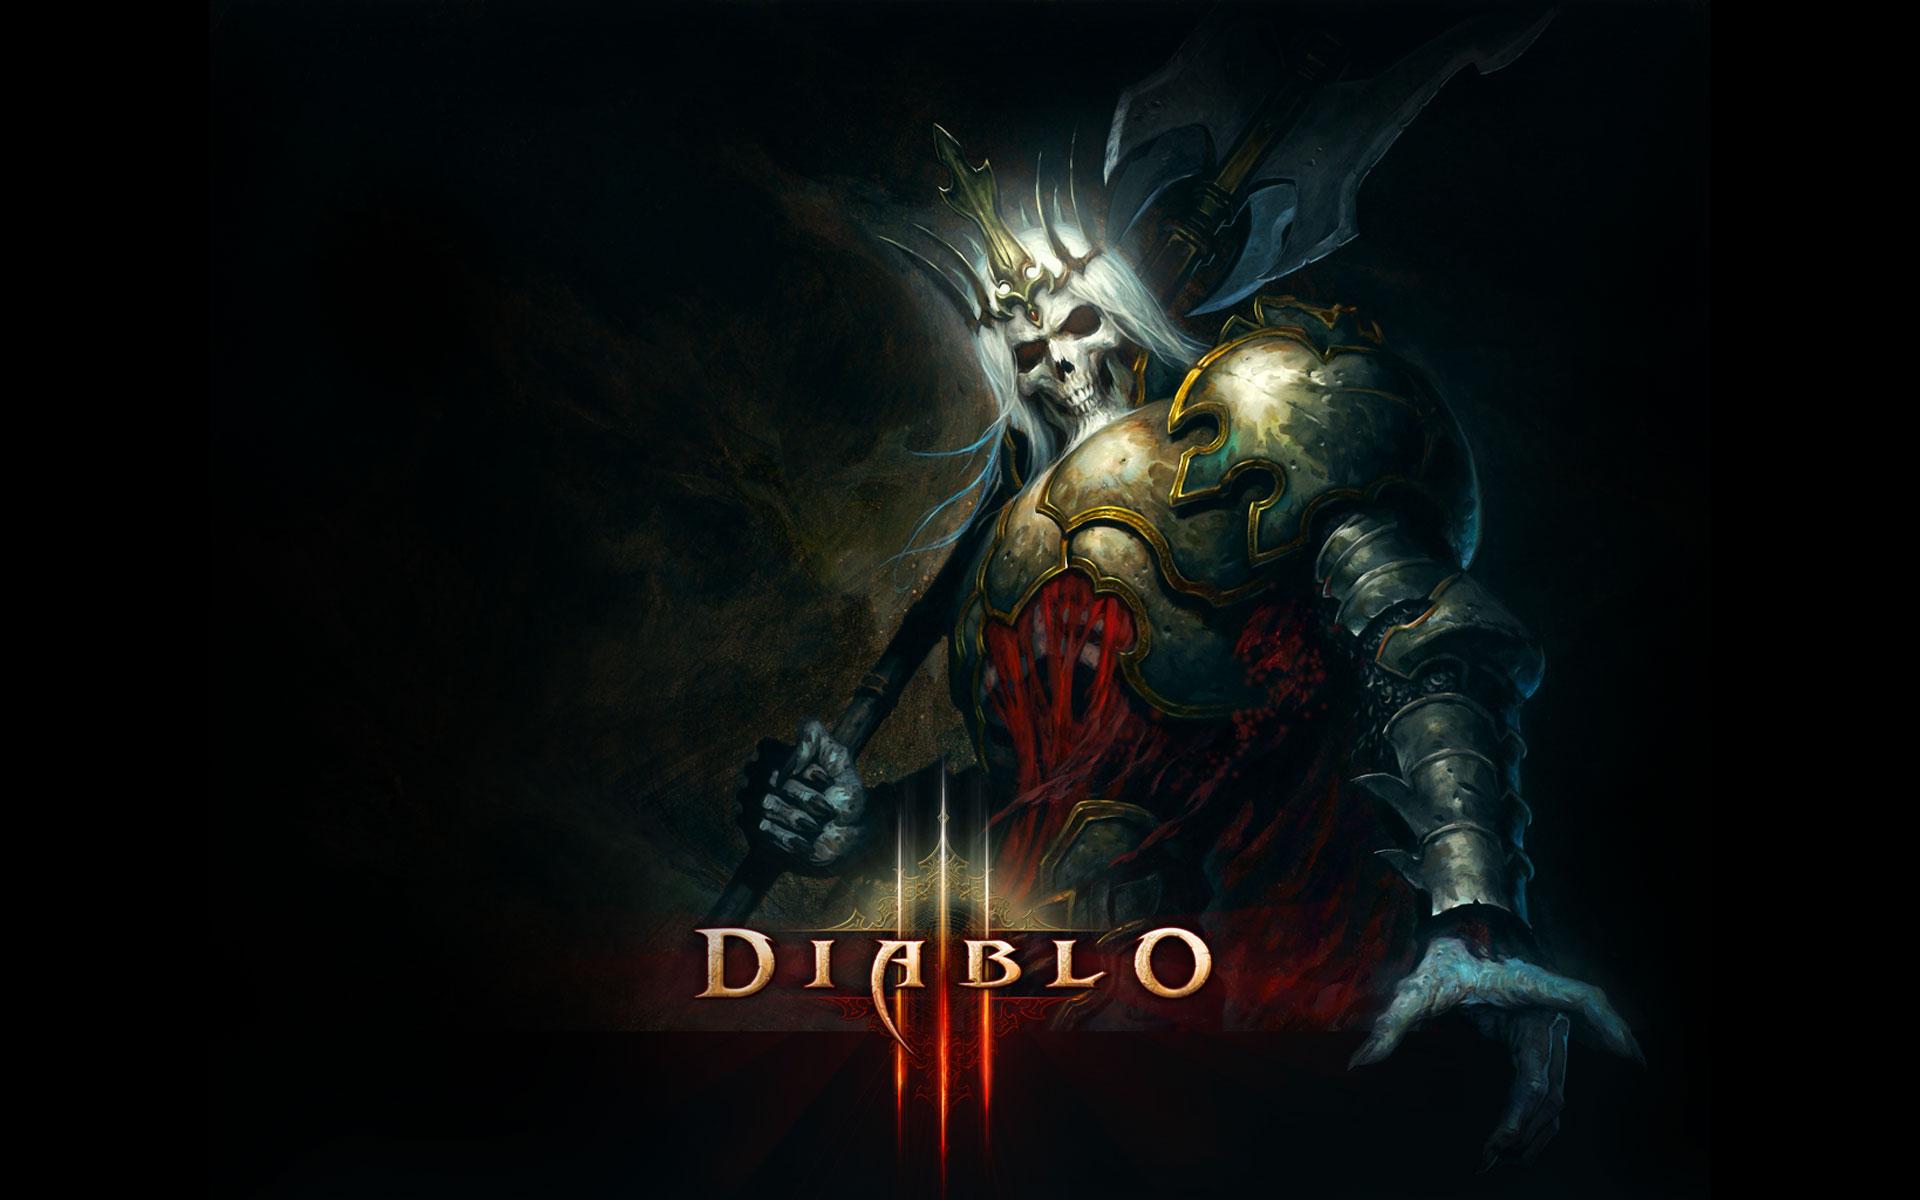 diablo 3 king leoric - photo #12